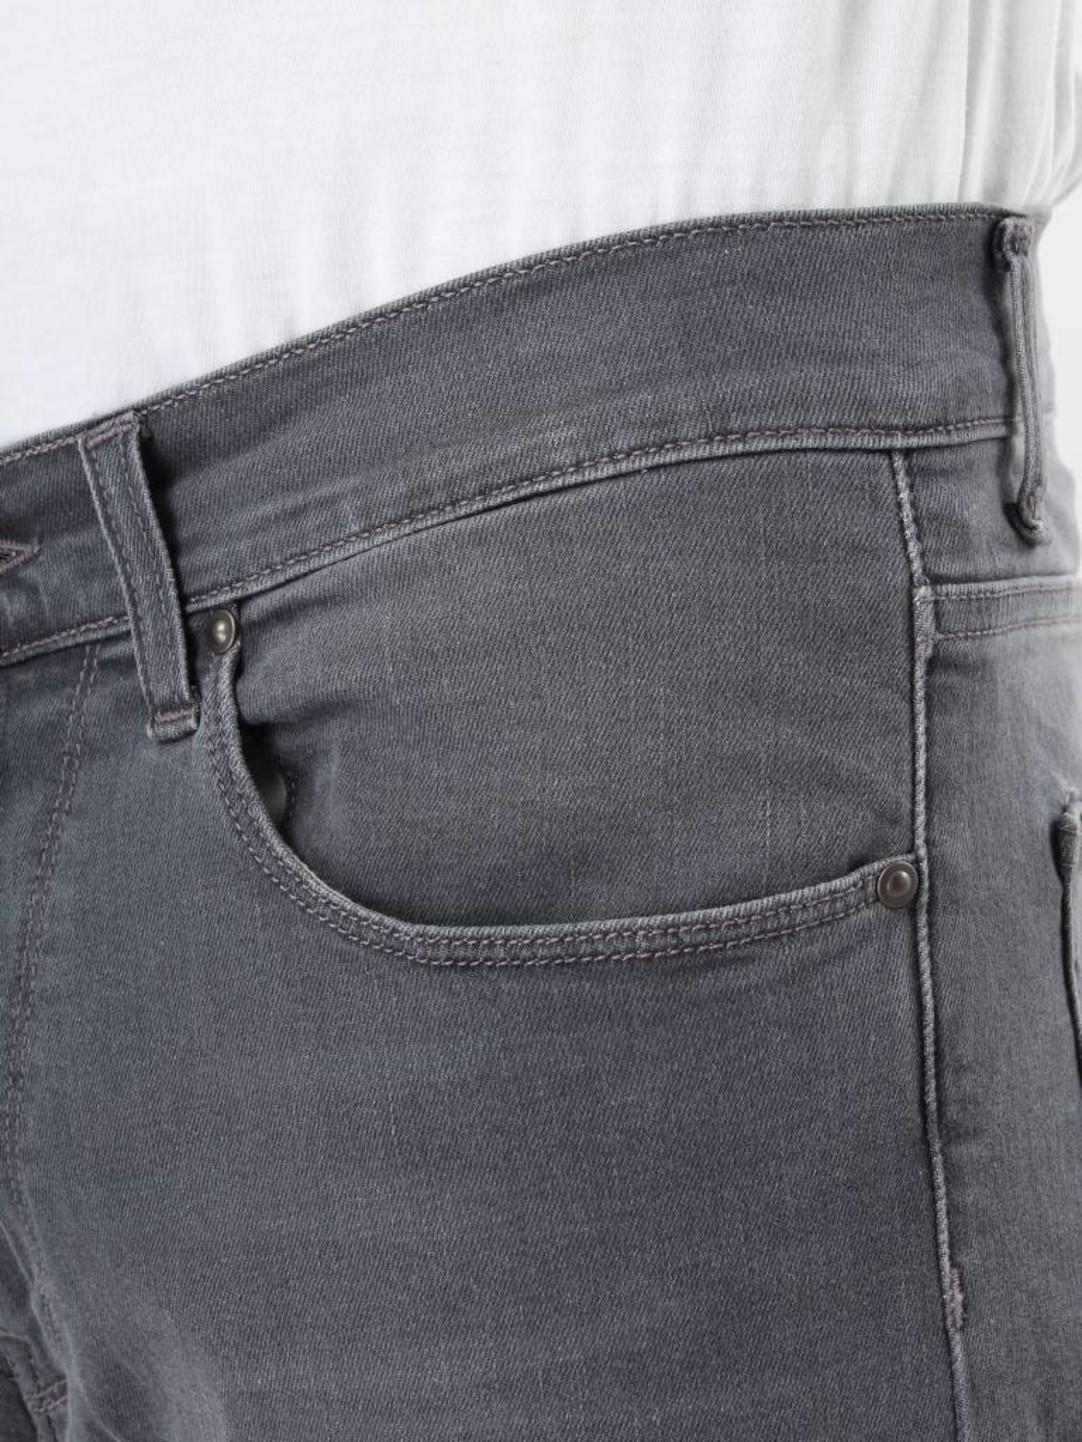 Carhartt WIP Carhartt WIP Vicious Pant Gravel Washed Grey I023024